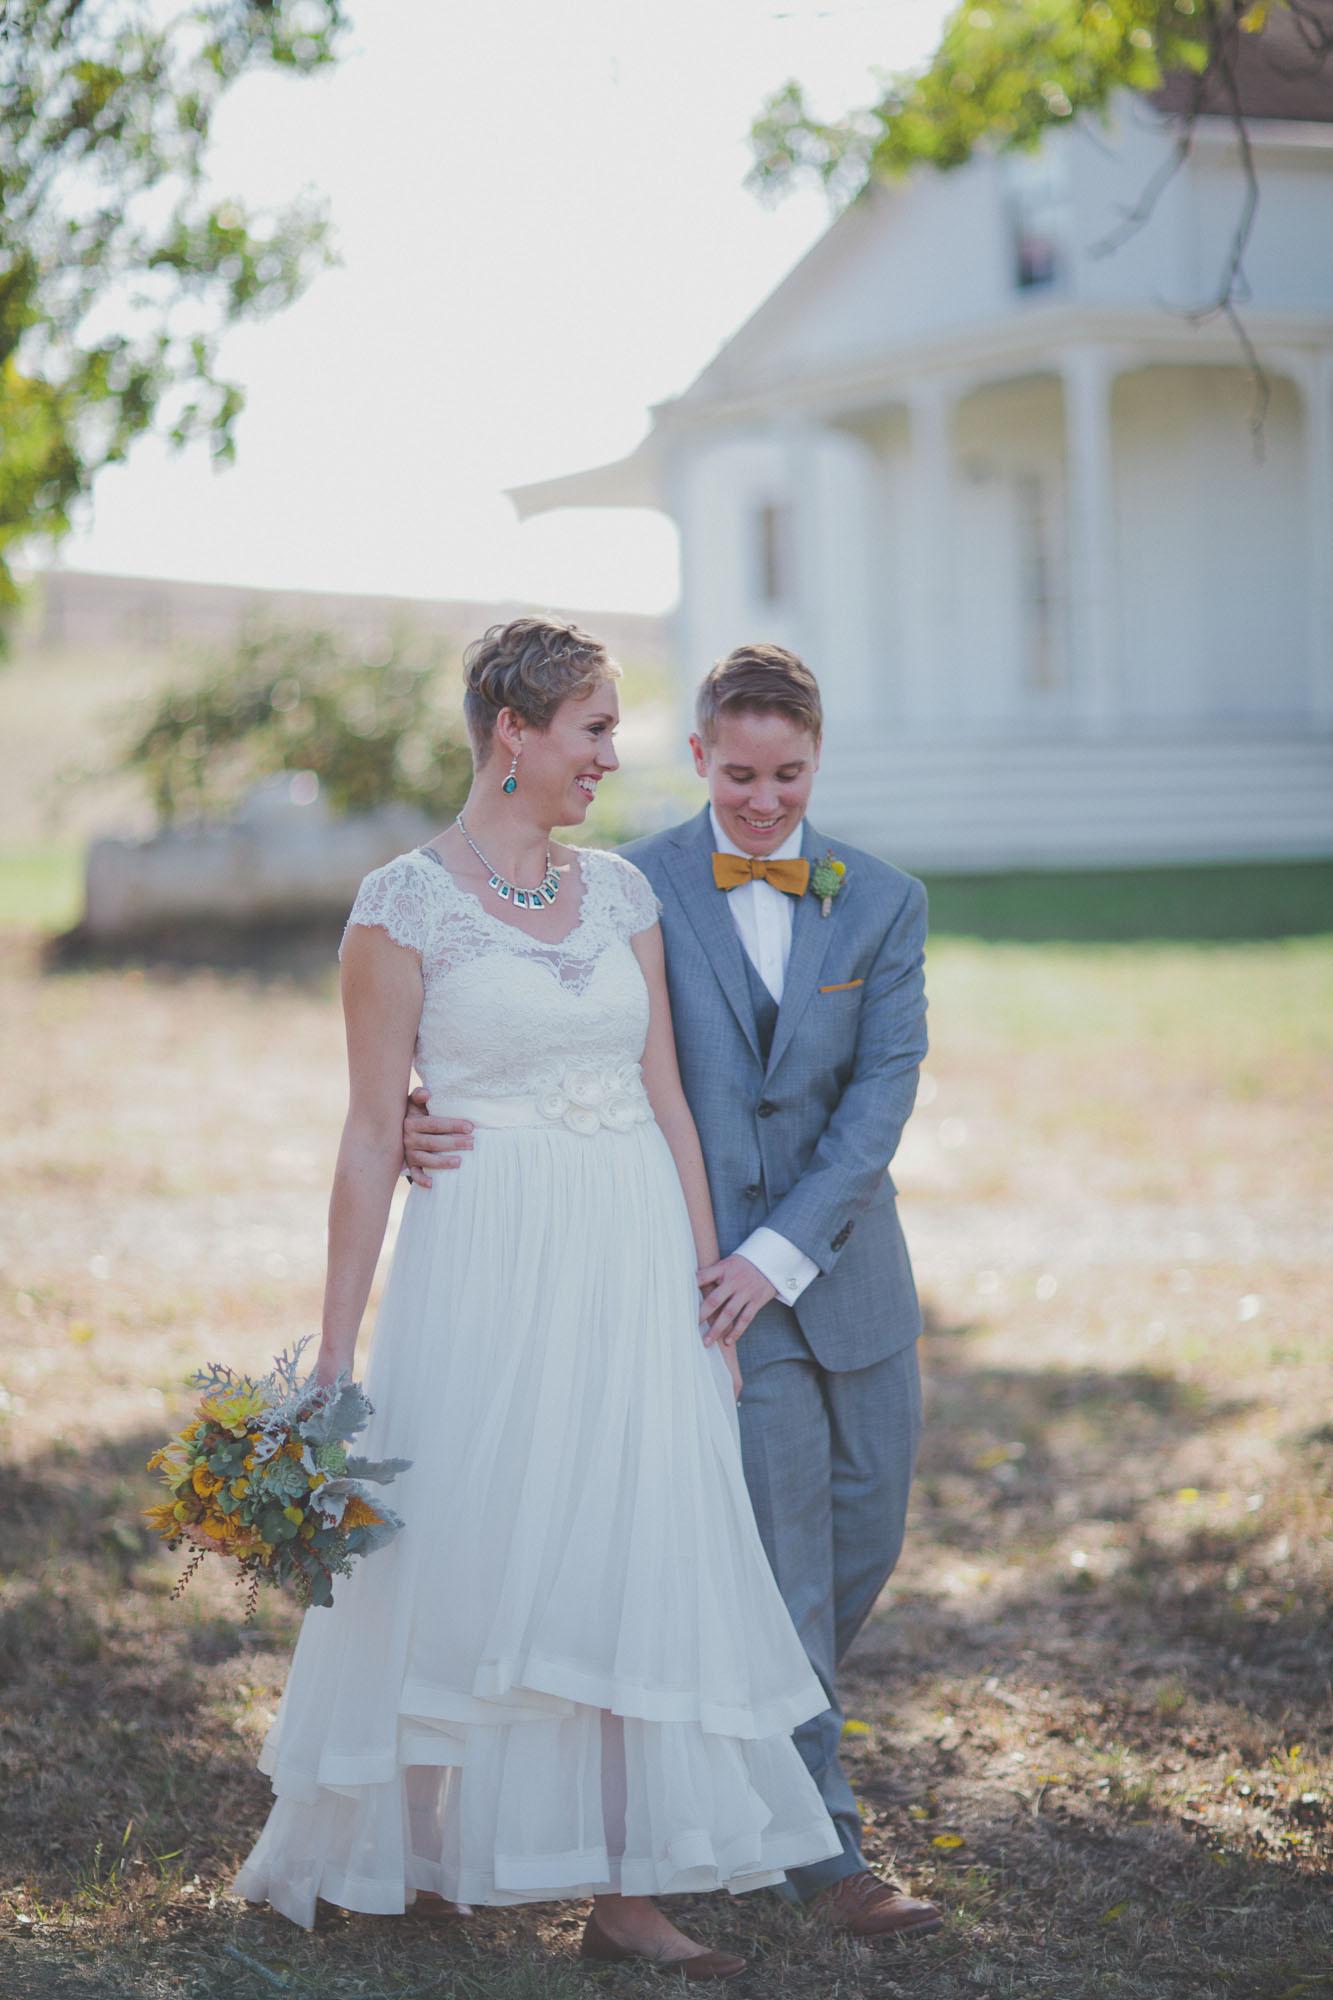 Gretchen_Gause_Petaluma_Olympias_Valley_Wedding_Photo-097.jpg